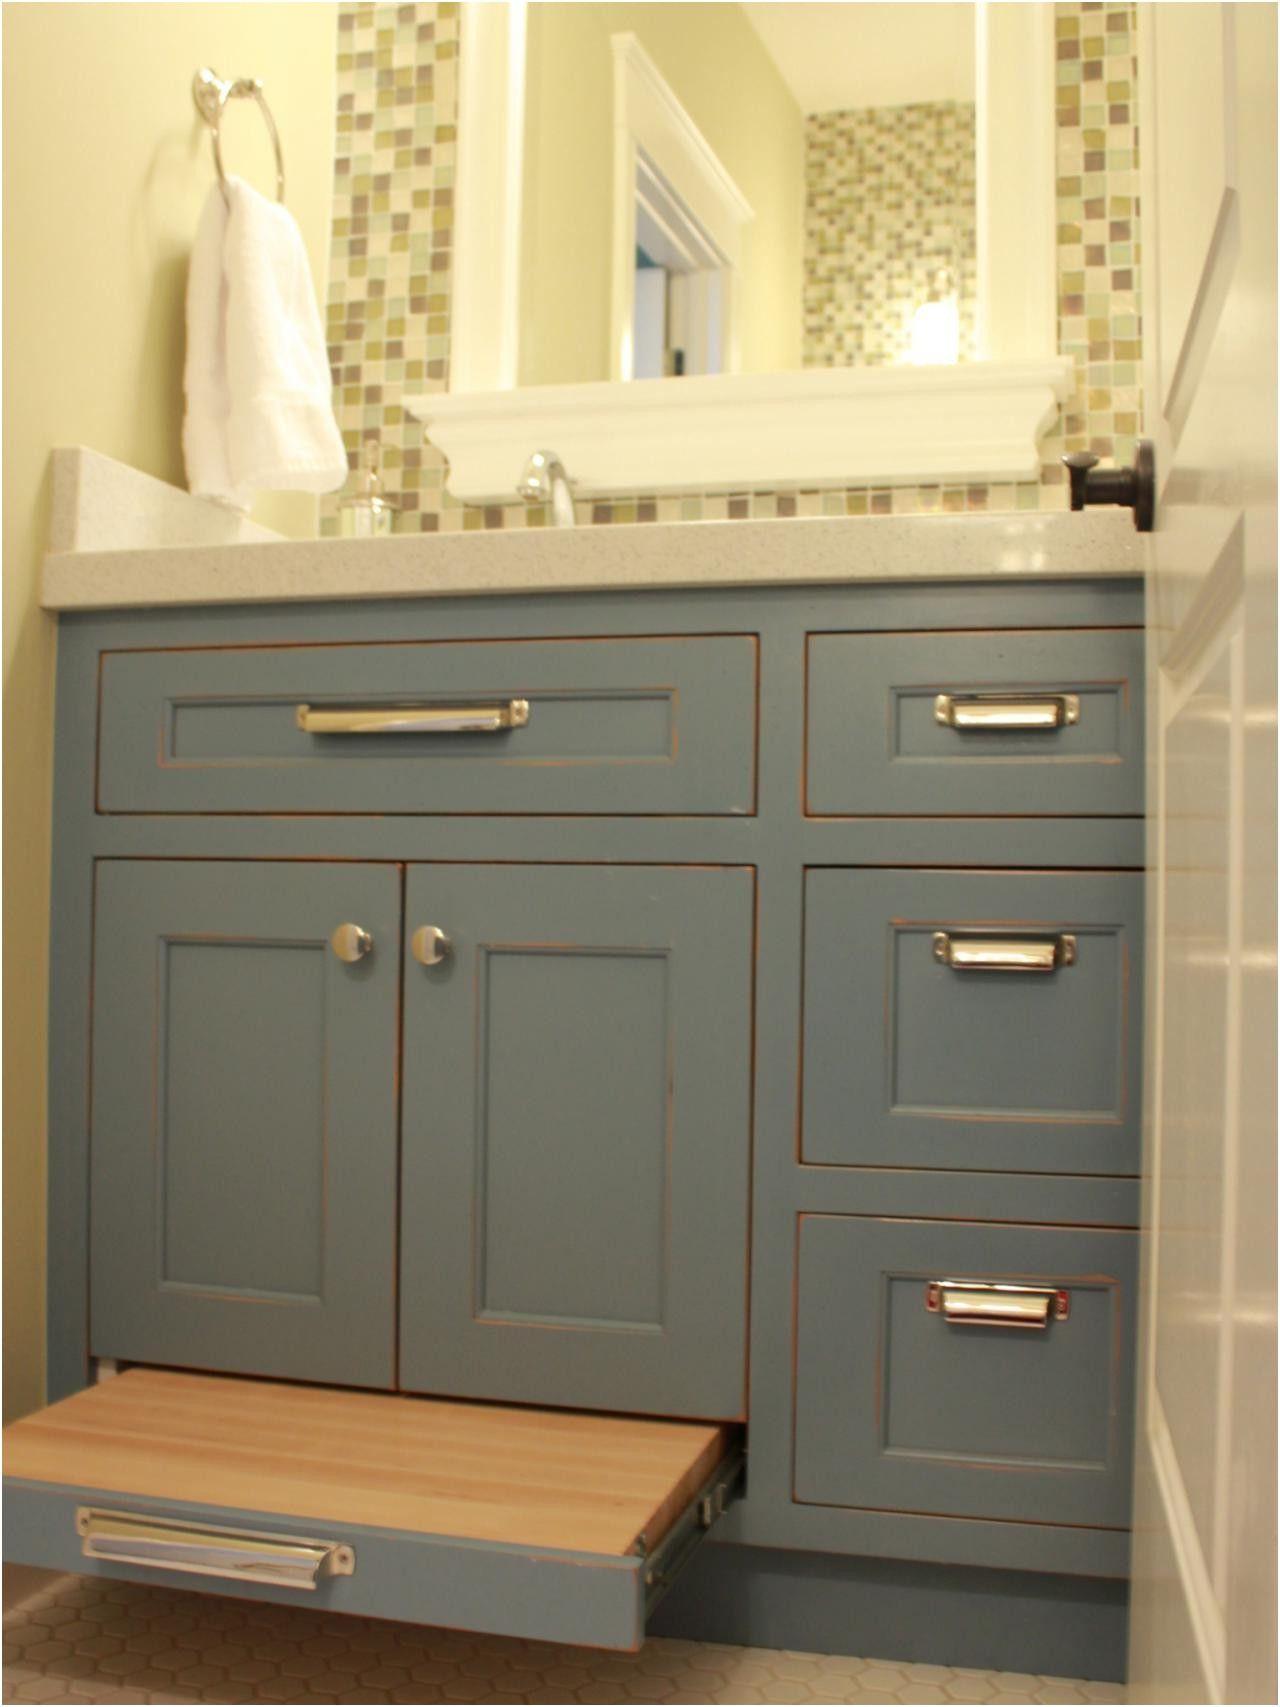 Bathroom Menards Vanity For Inspiring Cabinet From Cabinets Michigan